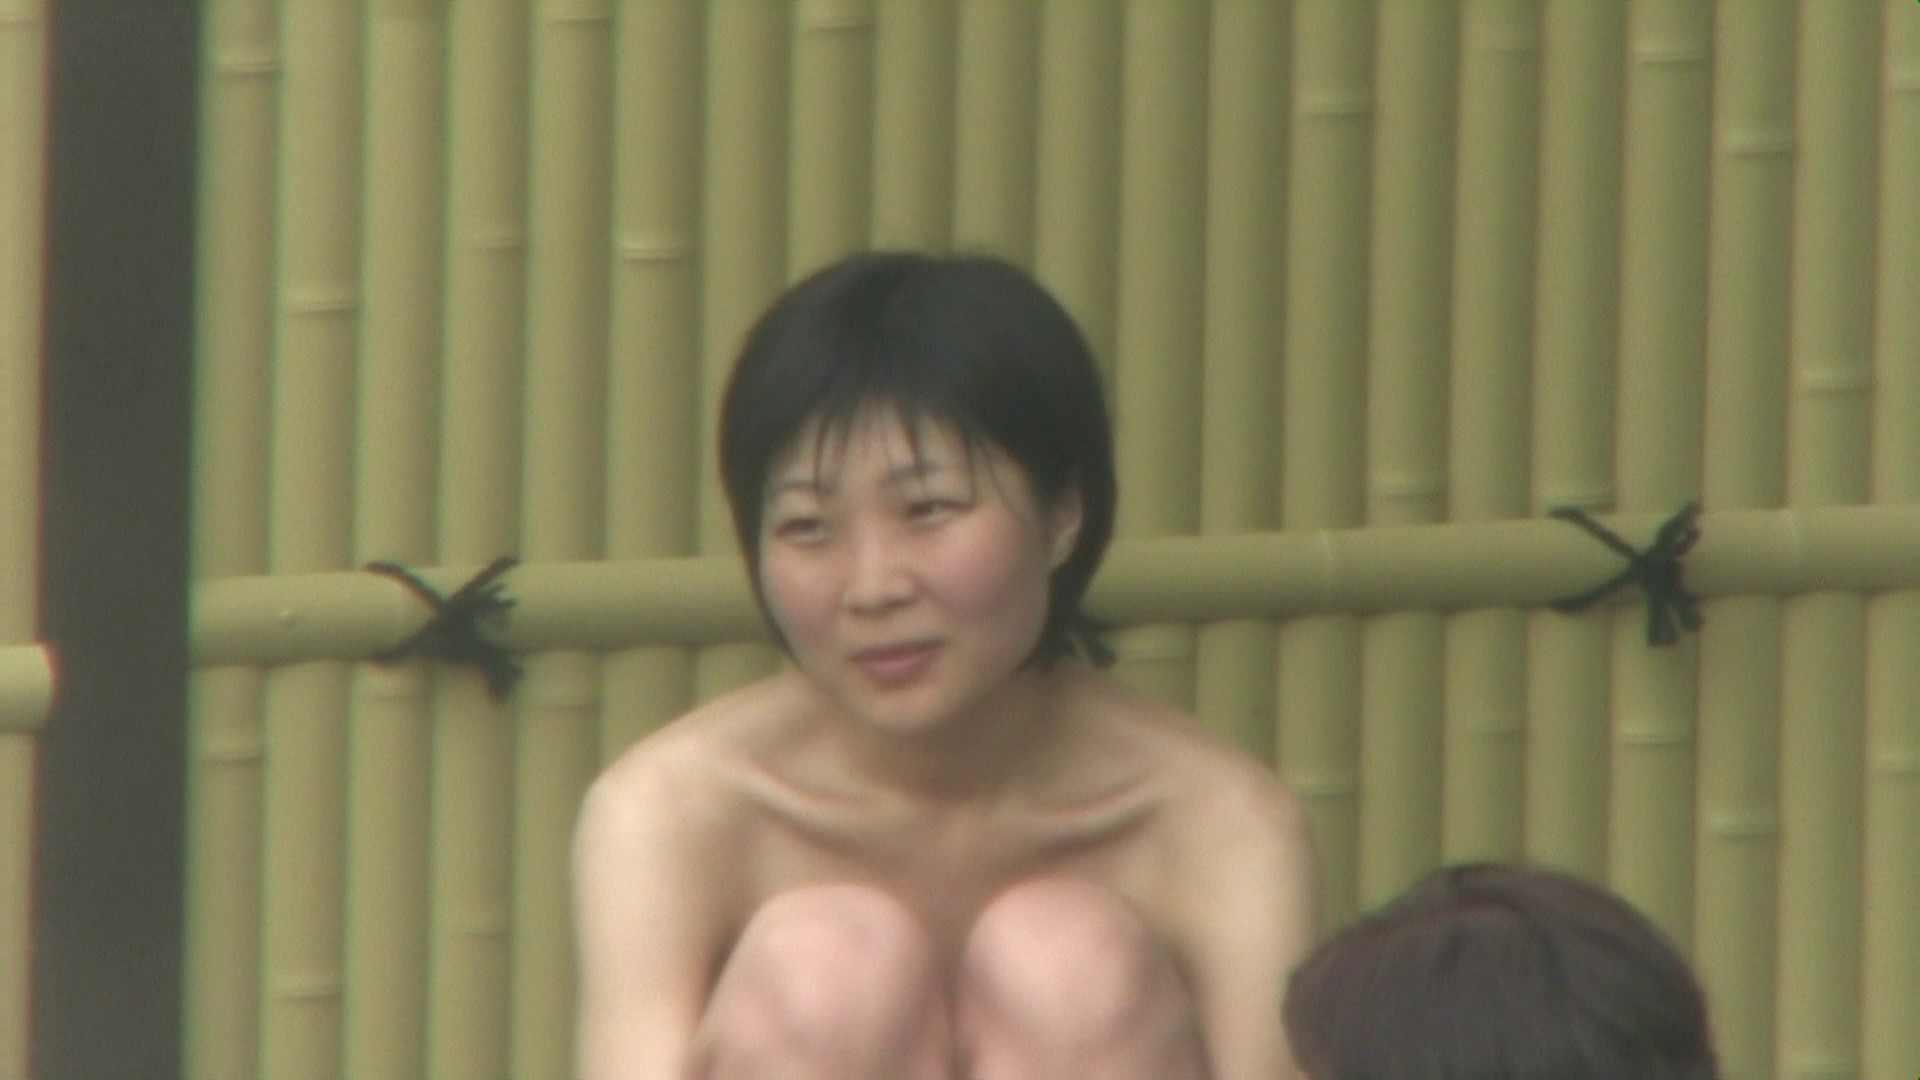 Aquaな露天風呂Vol.74【VIP限定】 綺麗なOLたち われめAV動画紹介 79枚 53